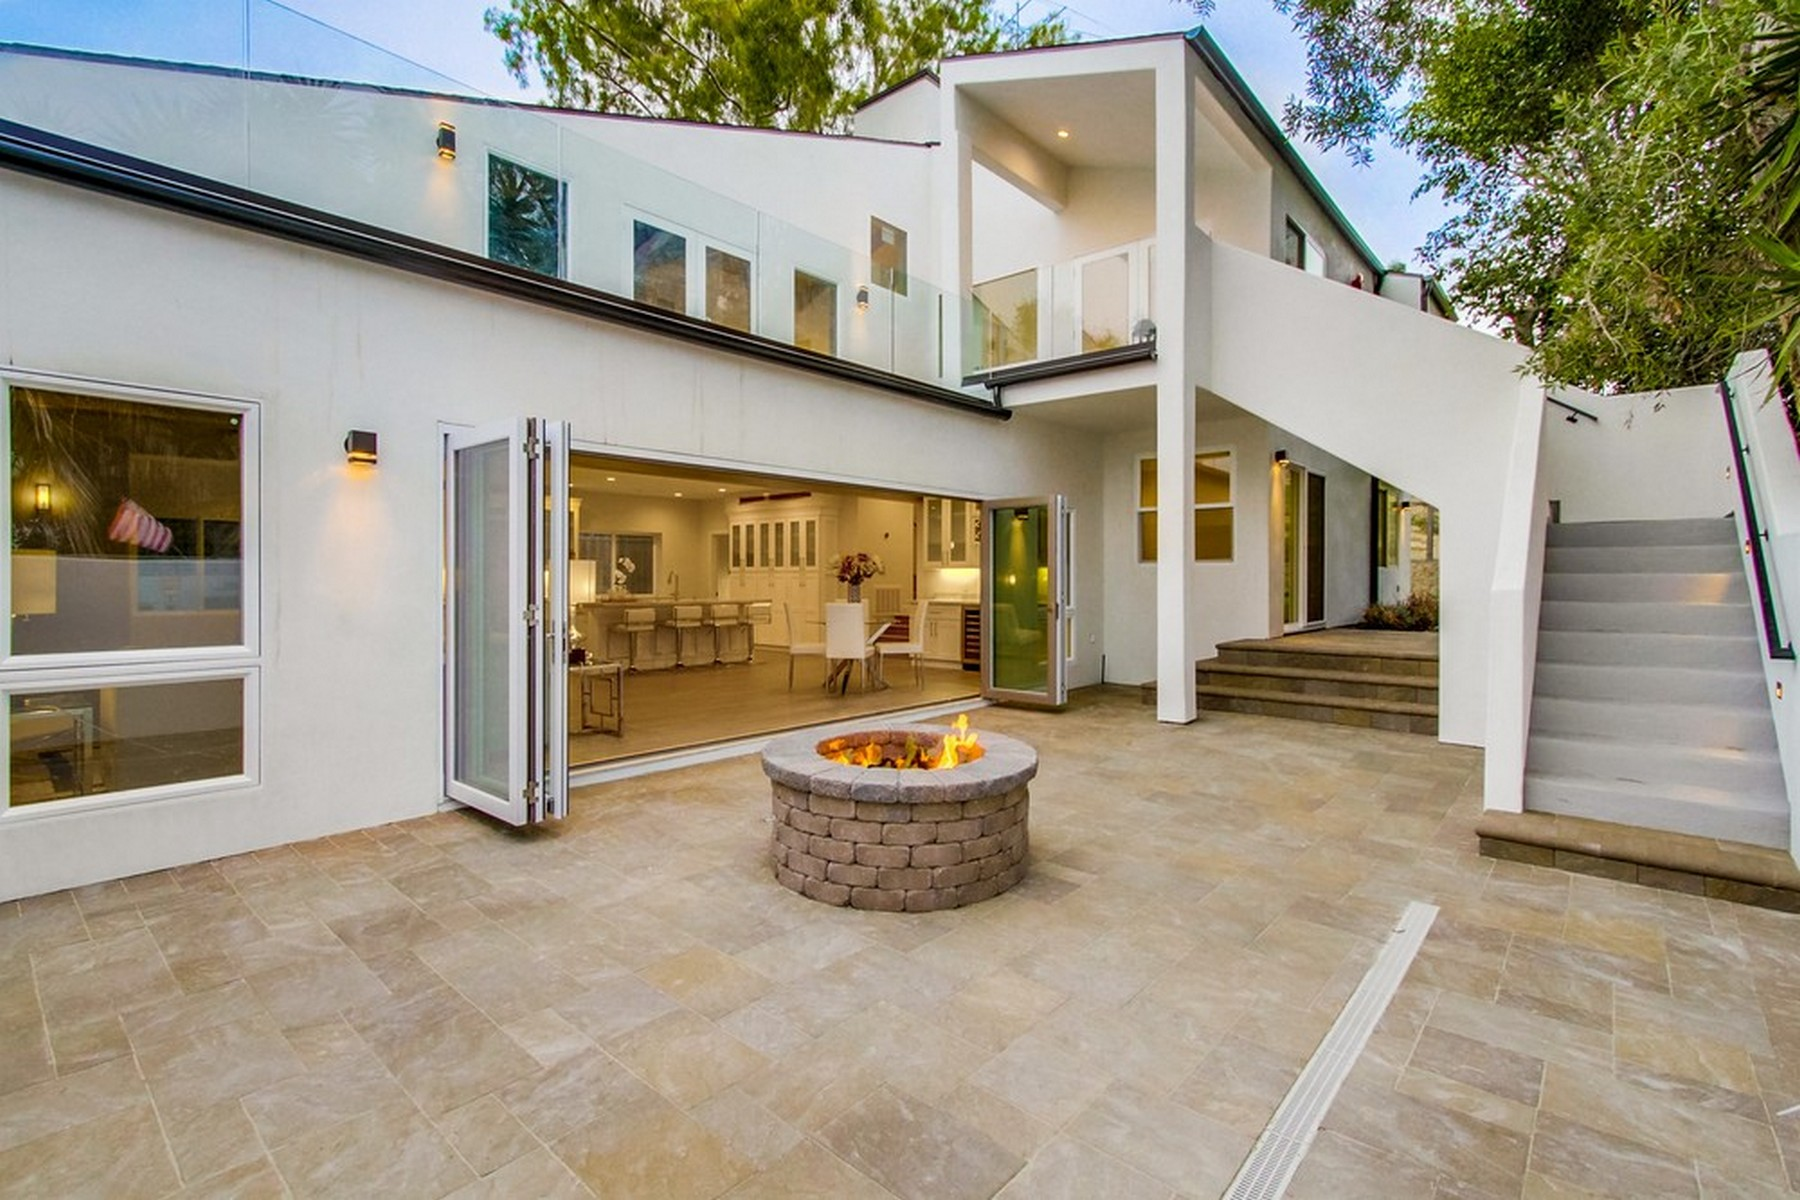 Single Family Home for Sale at 831 Passiflora Avenue 831 Passiflora Avenue Encinitas, California 92024 United States